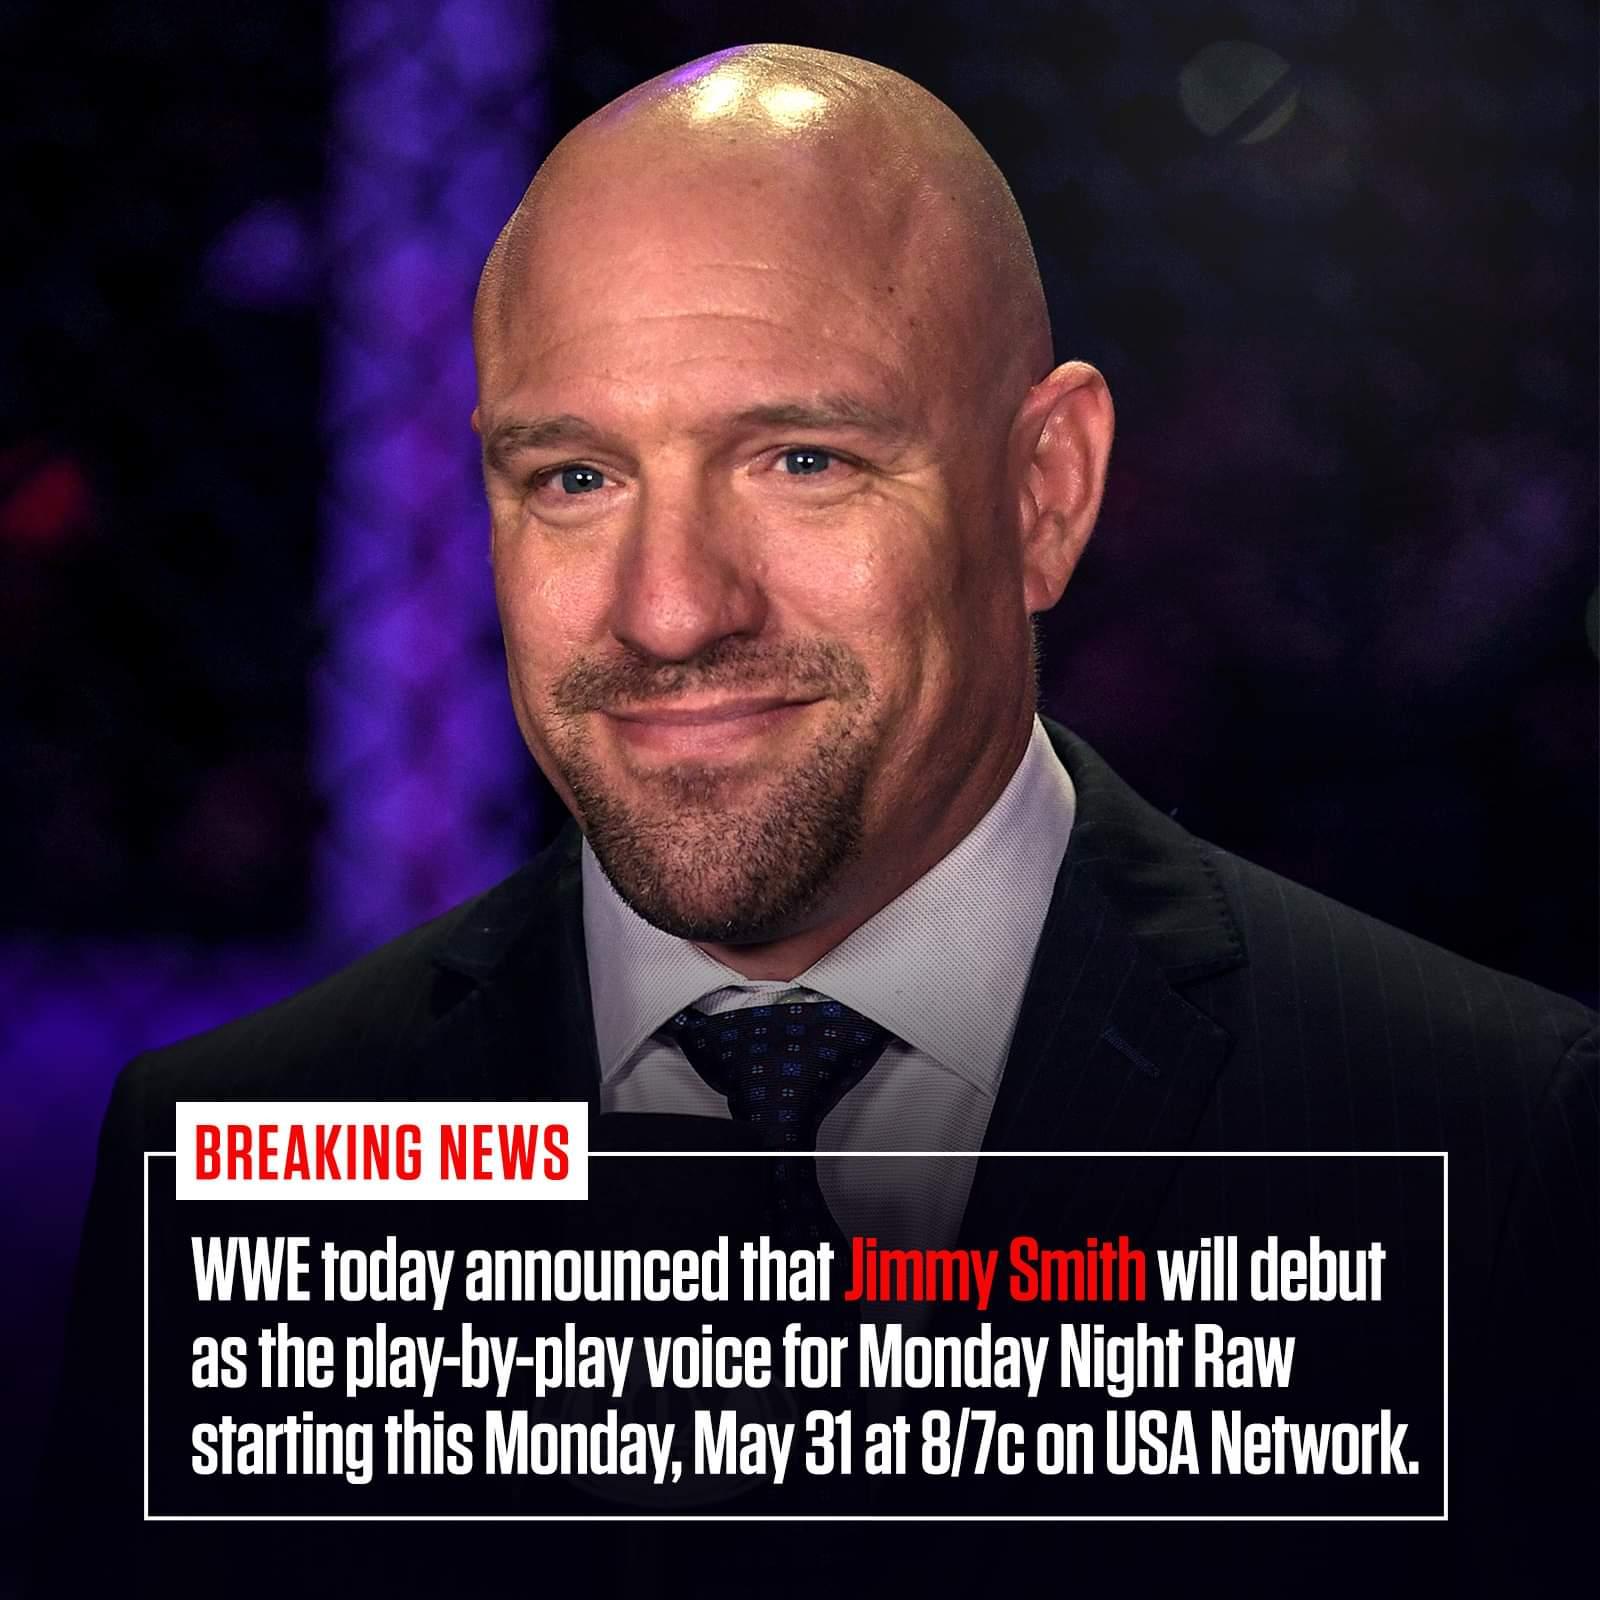 Welcome to WWE Raw, Jimmy Smith!